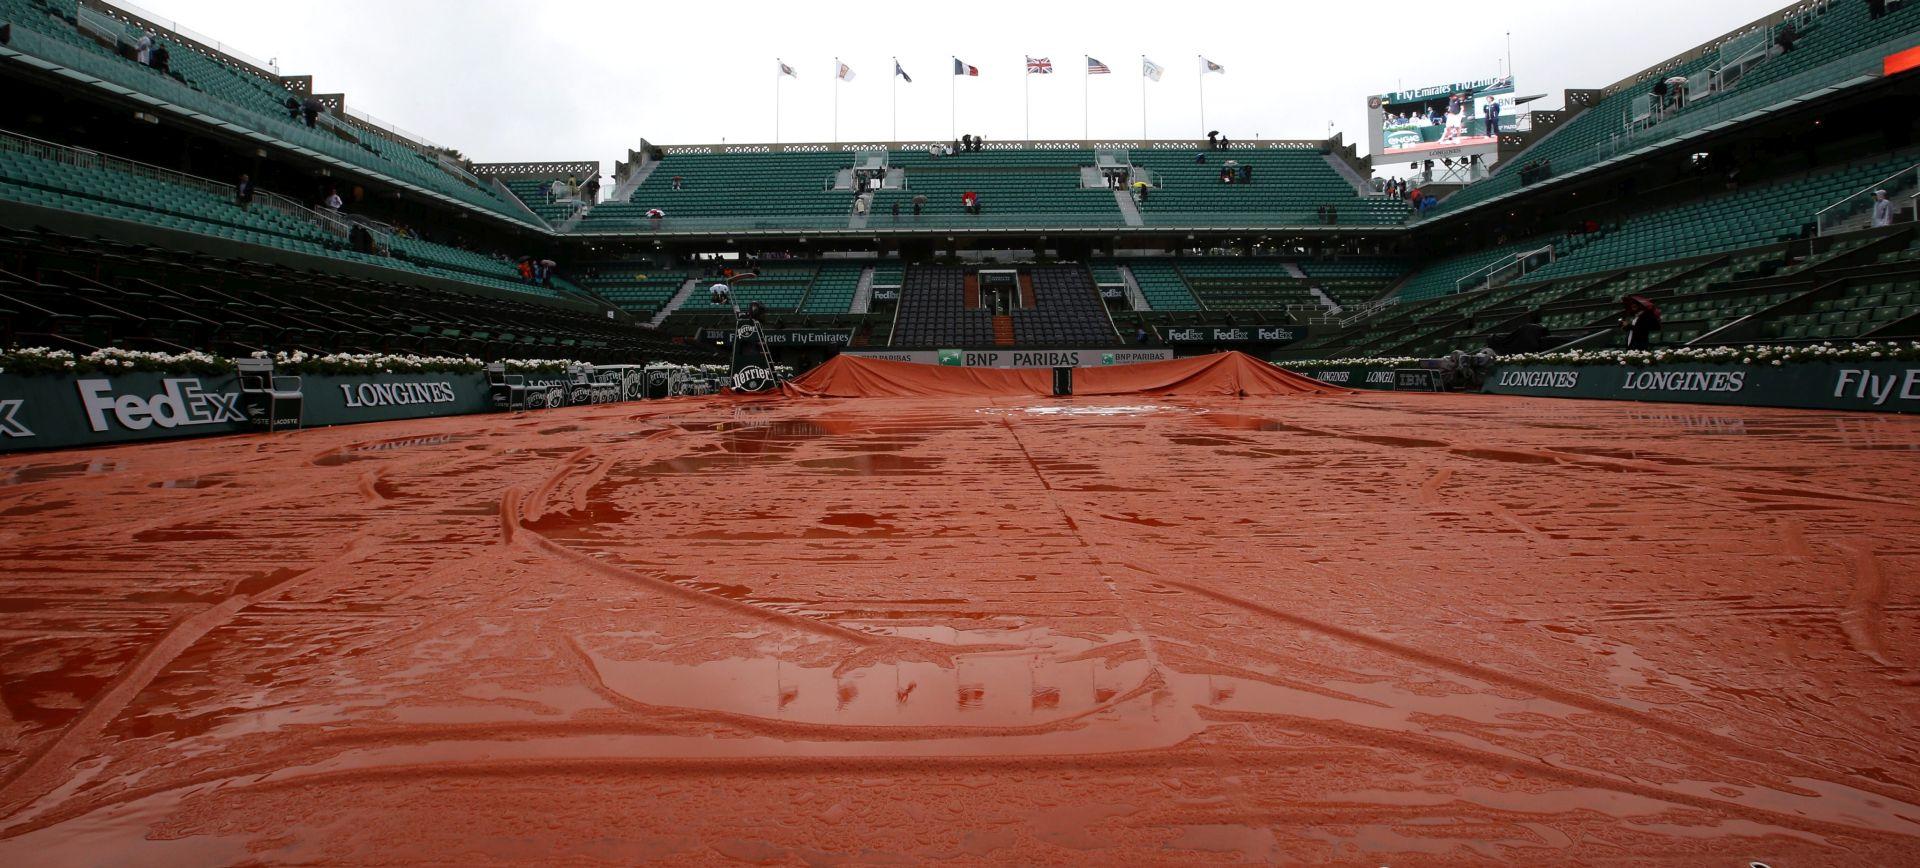 Roland Garros: Povećan nagradni fond